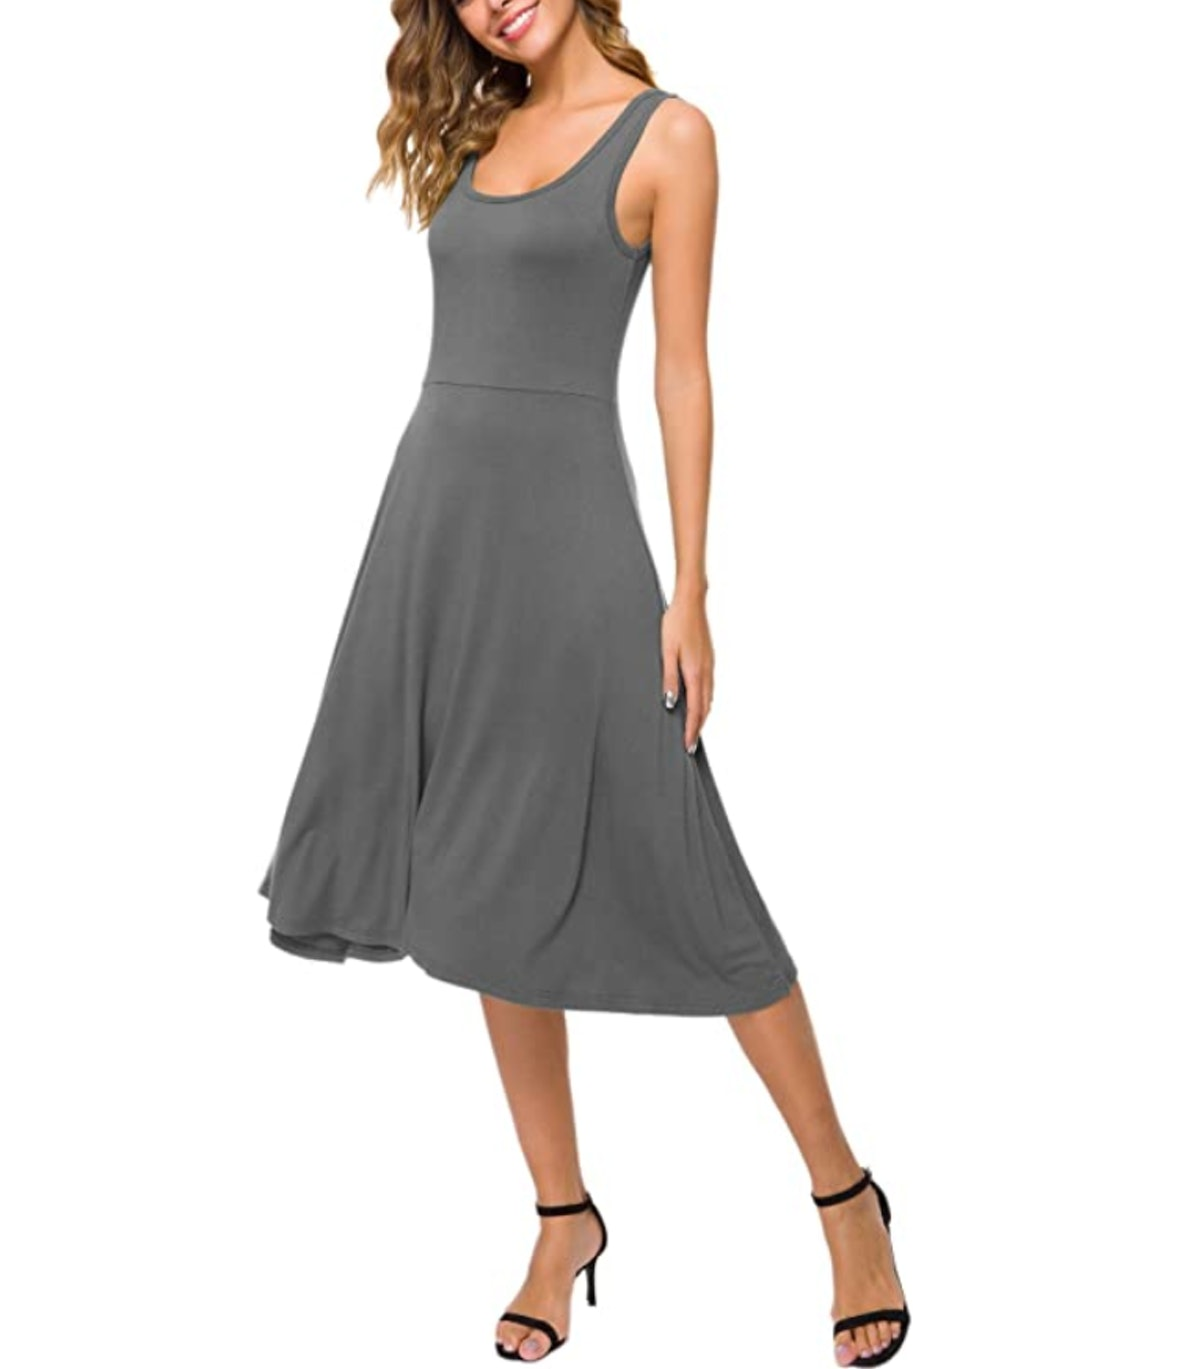 Urban CoCo Women's Sleeveless Midi Dress